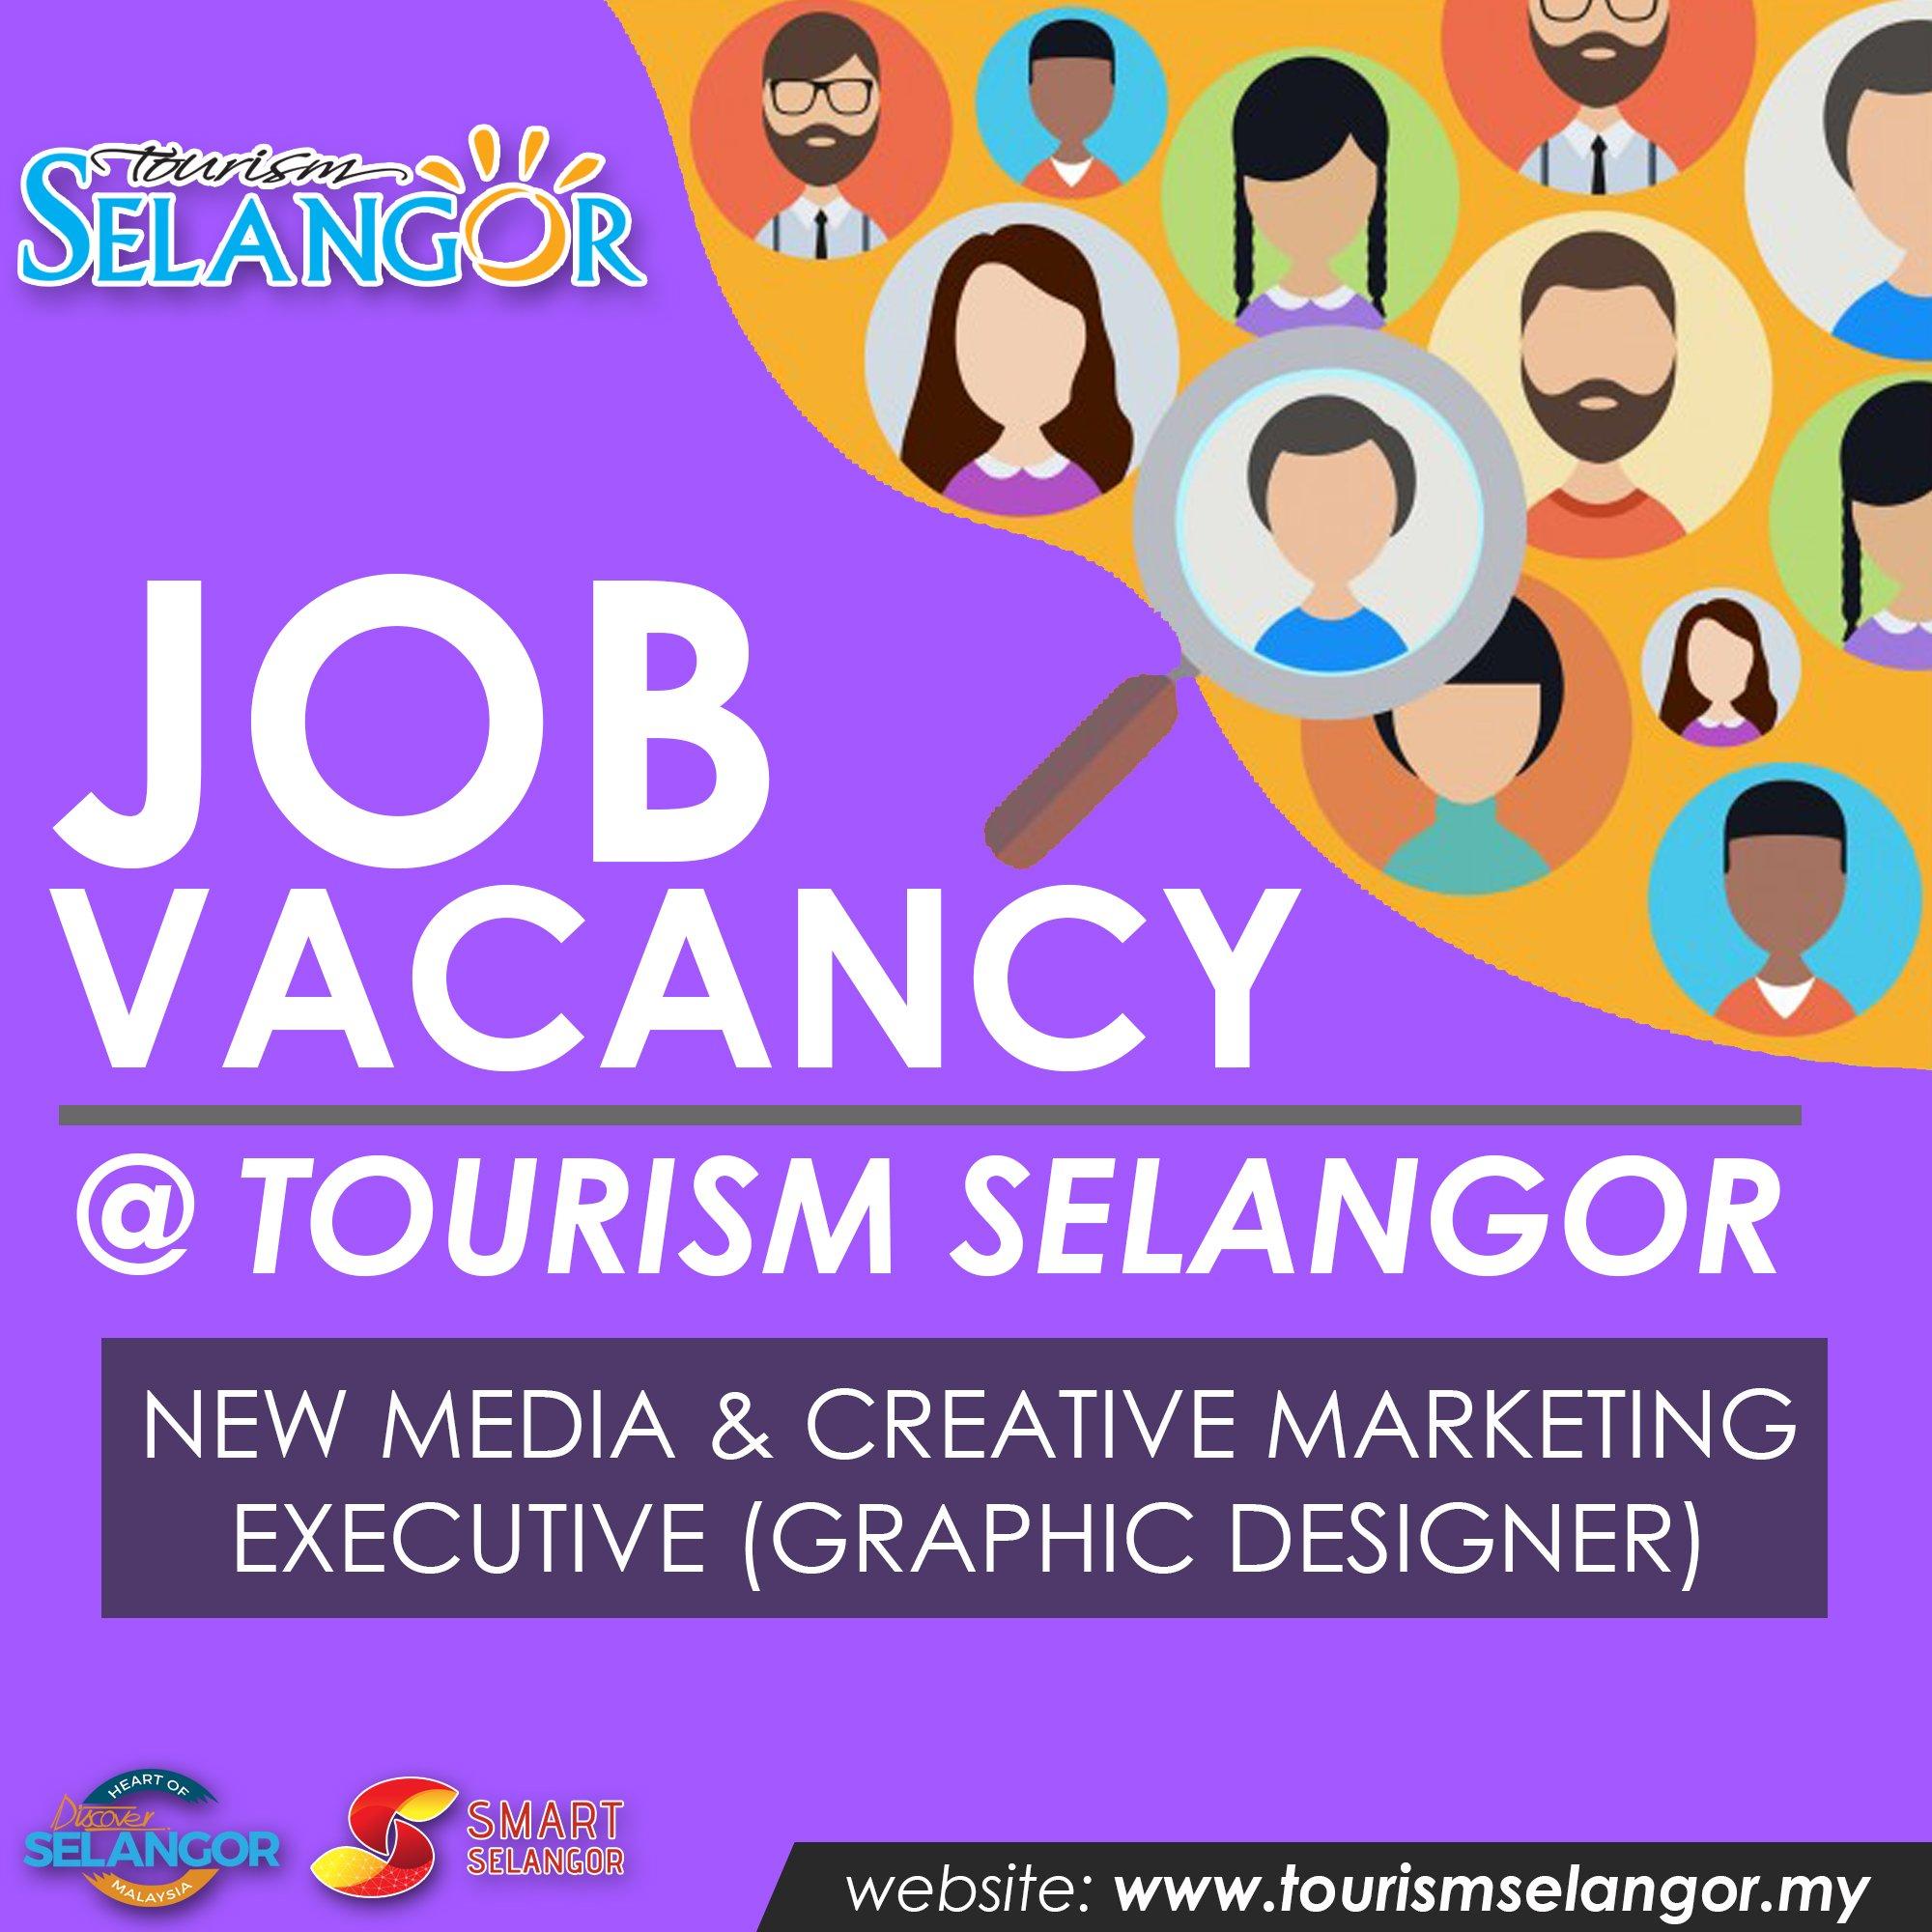 Tourism Selangor On Twitter Job Vacancy Tourism Selangor Position New Media Creative Marketing Executive Graphic Designer Click Link Below To Apply Https T Co L32uqou9qh Dateline 18 April 2018 11 59pm Twtshah Alam Media Selangor Wearekl